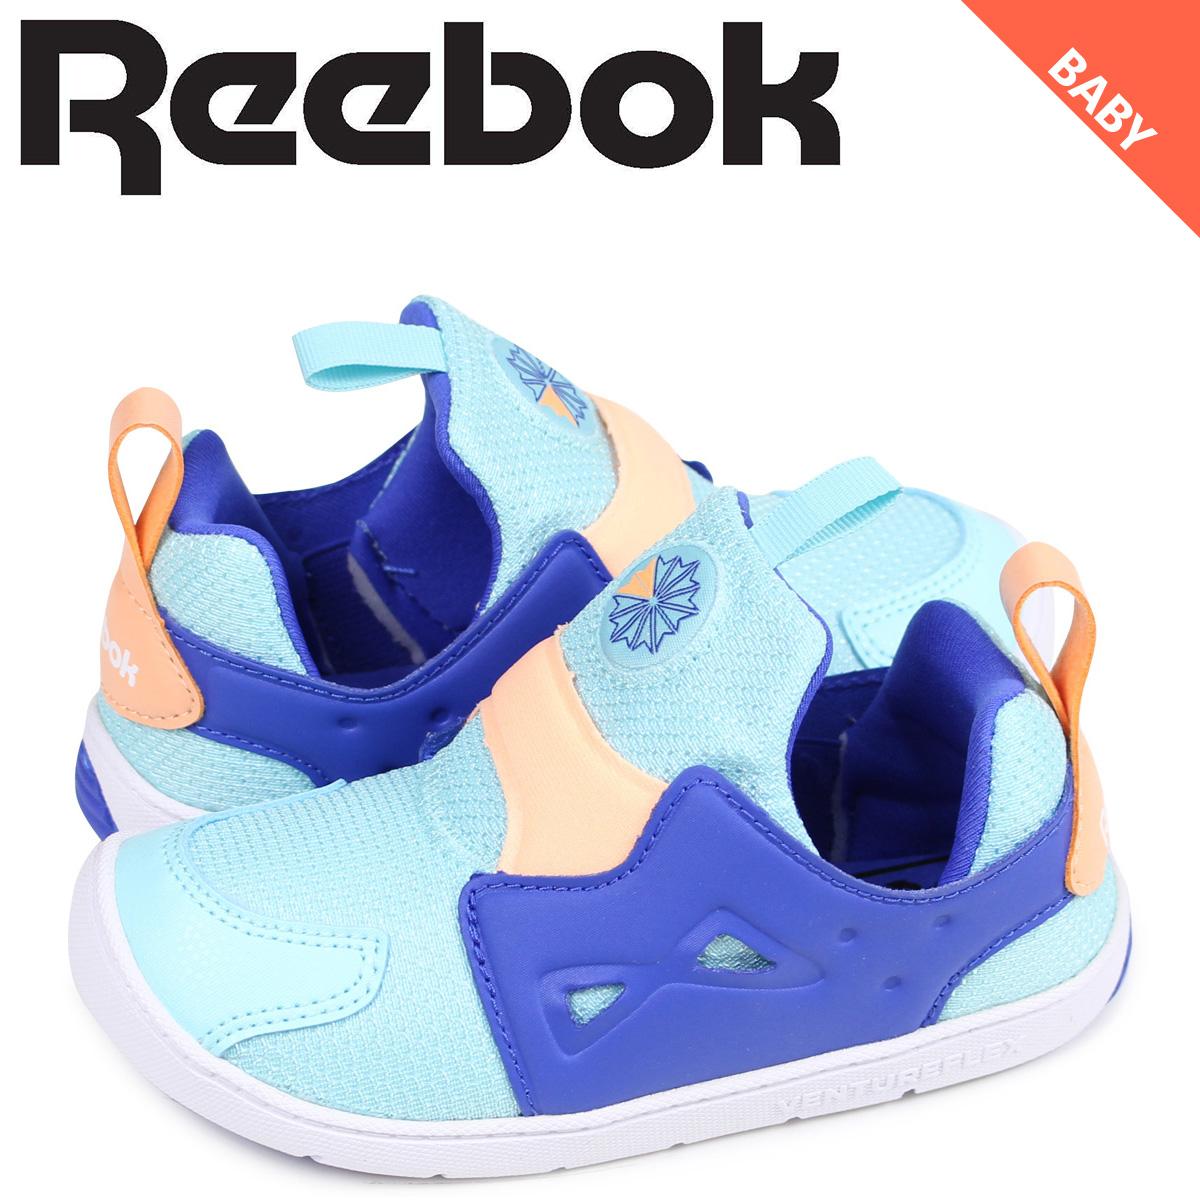 Sugar Online Shop  Reebok venture flextime baby sneakers slip-ons Reebok  VENTURE FLEX 2.0 CM9145 blue  ebe96c39d